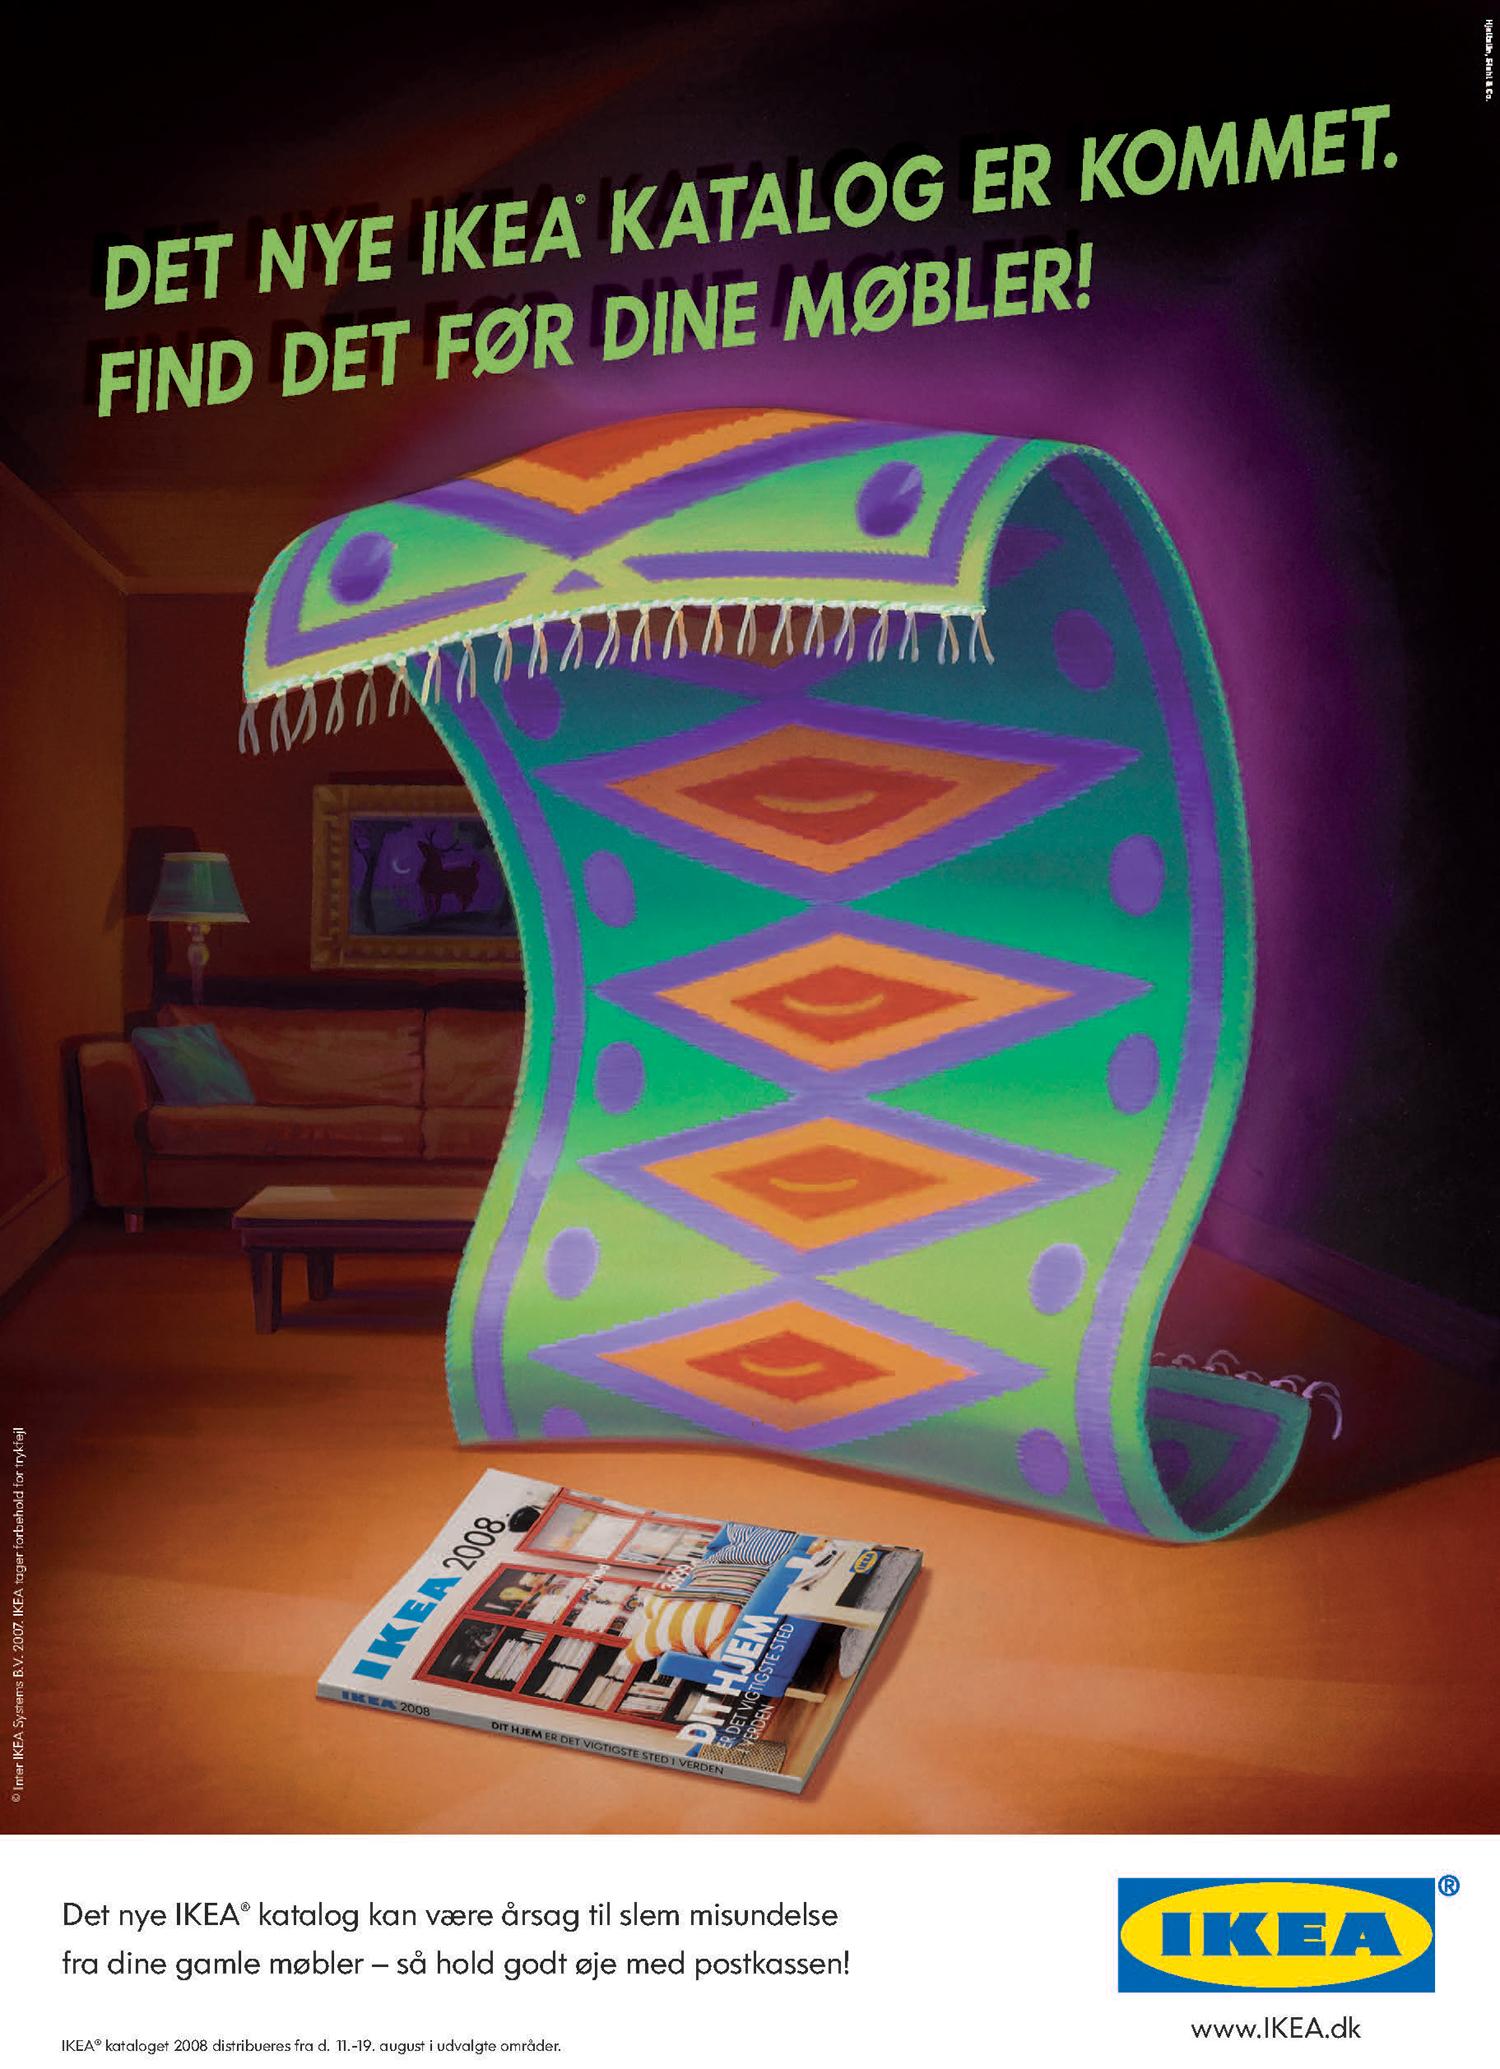 1653_katalog_annoncer_tabloid_taeppe_T.jpg